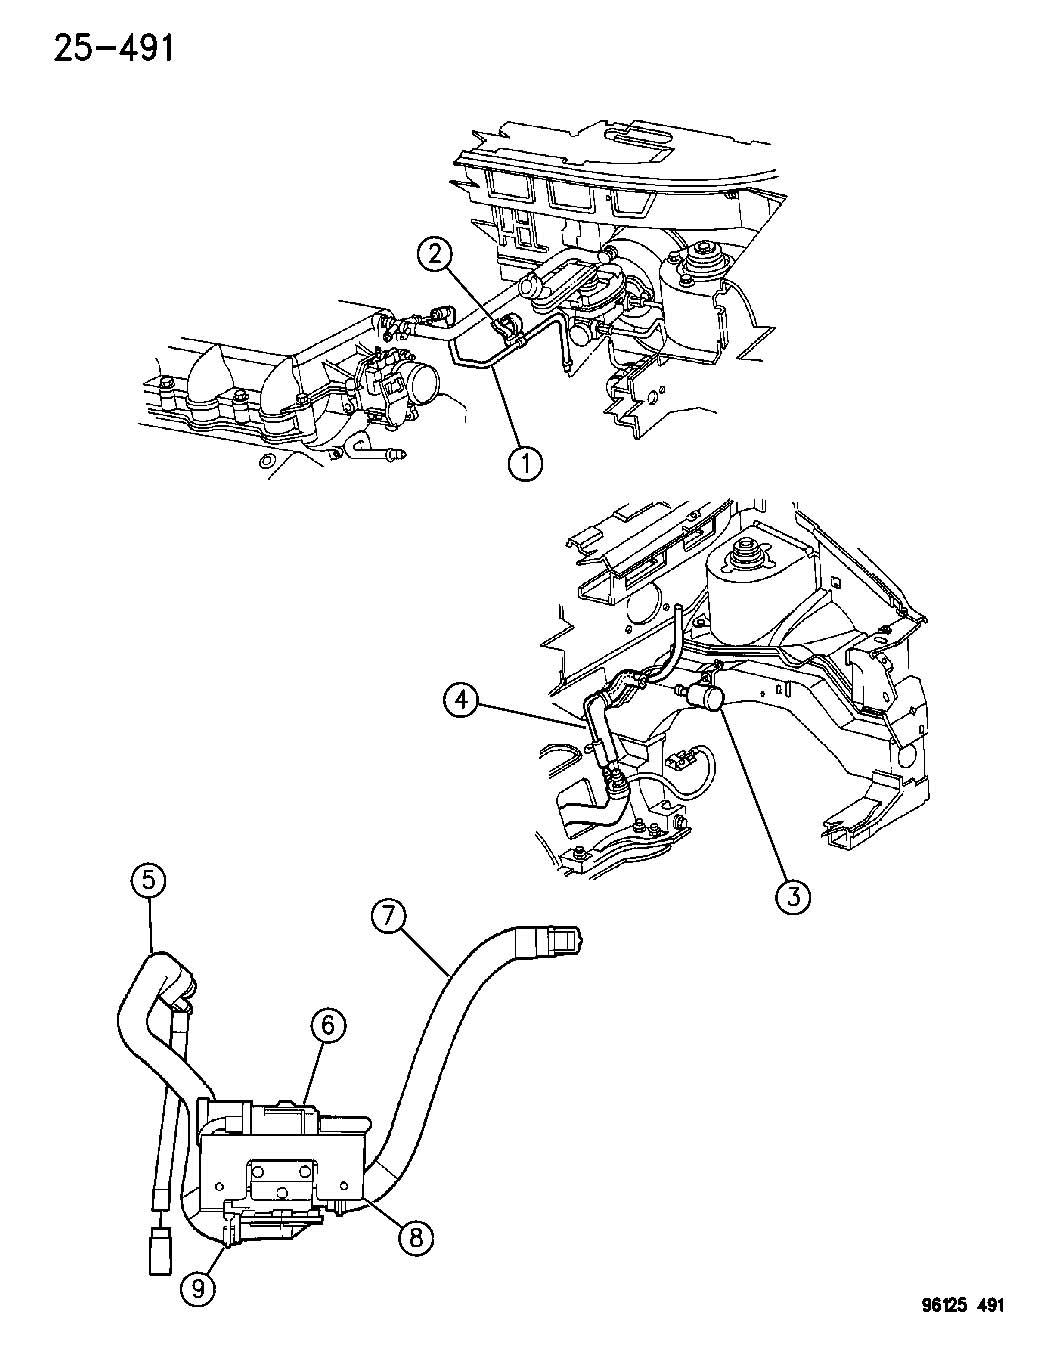 Jeep Liberty Pump Leak Detection Pump Leak